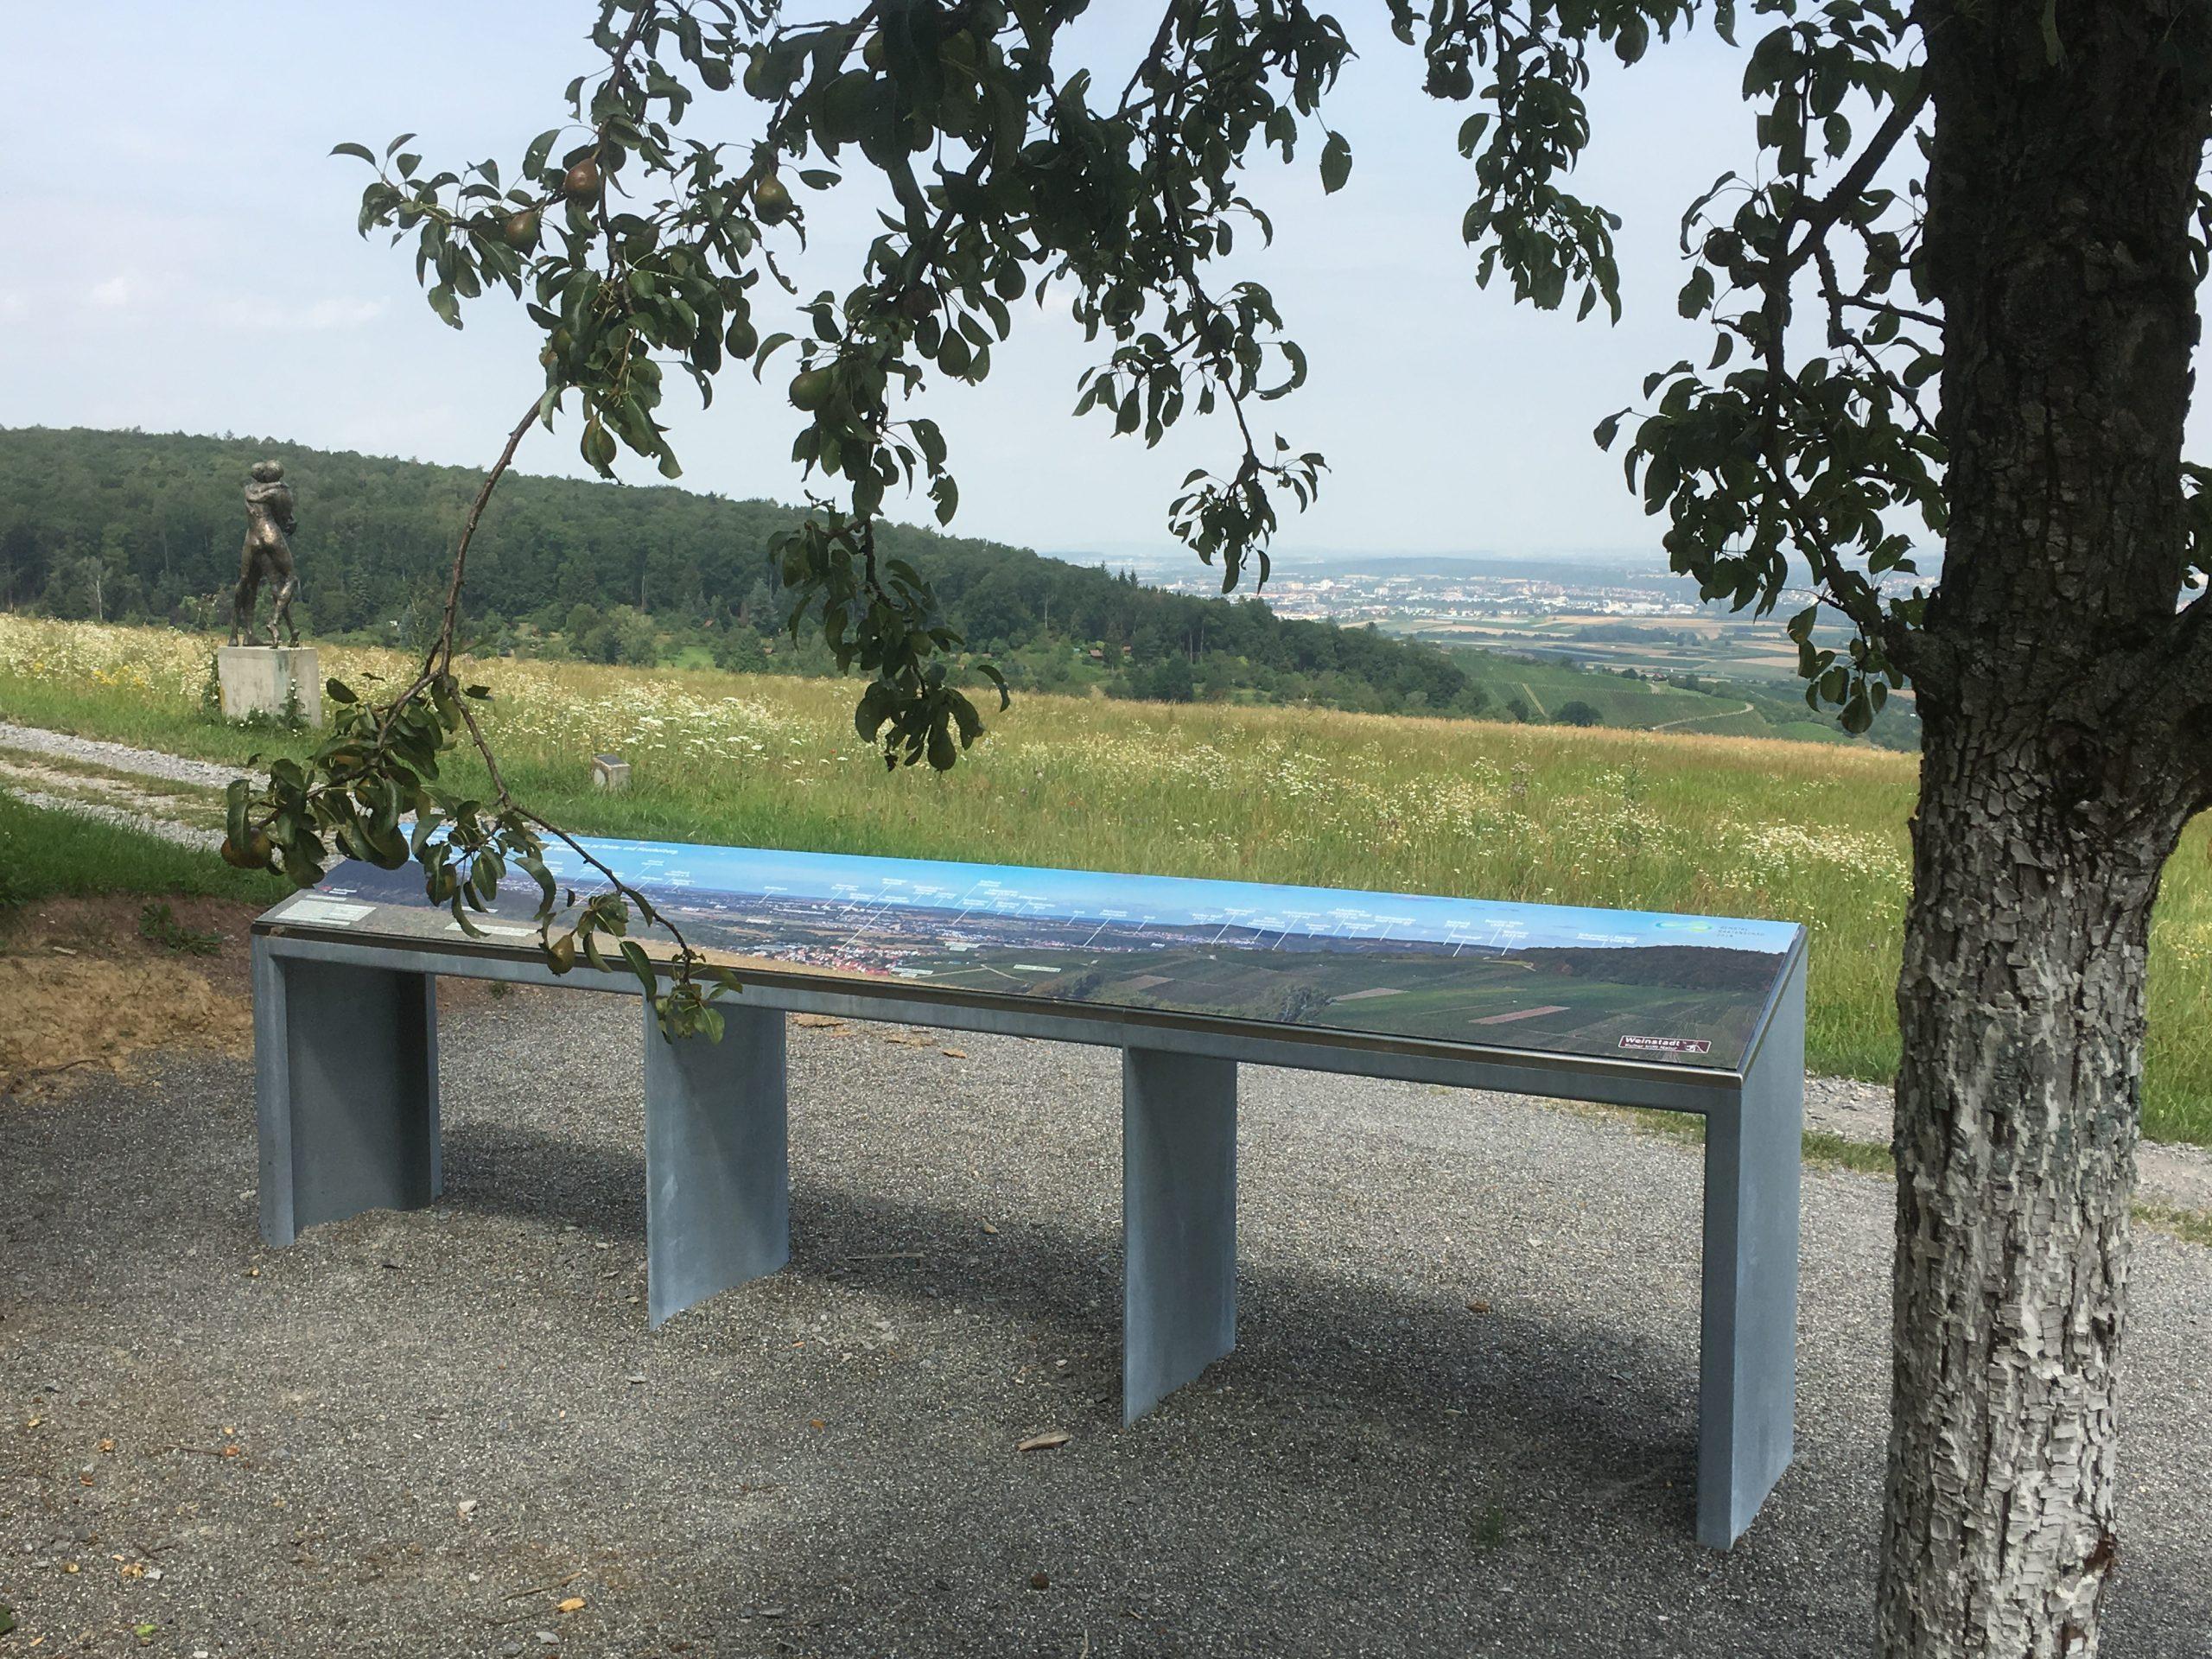 Panoramaausblick vom NaturFreundehaus Strümpfelbach